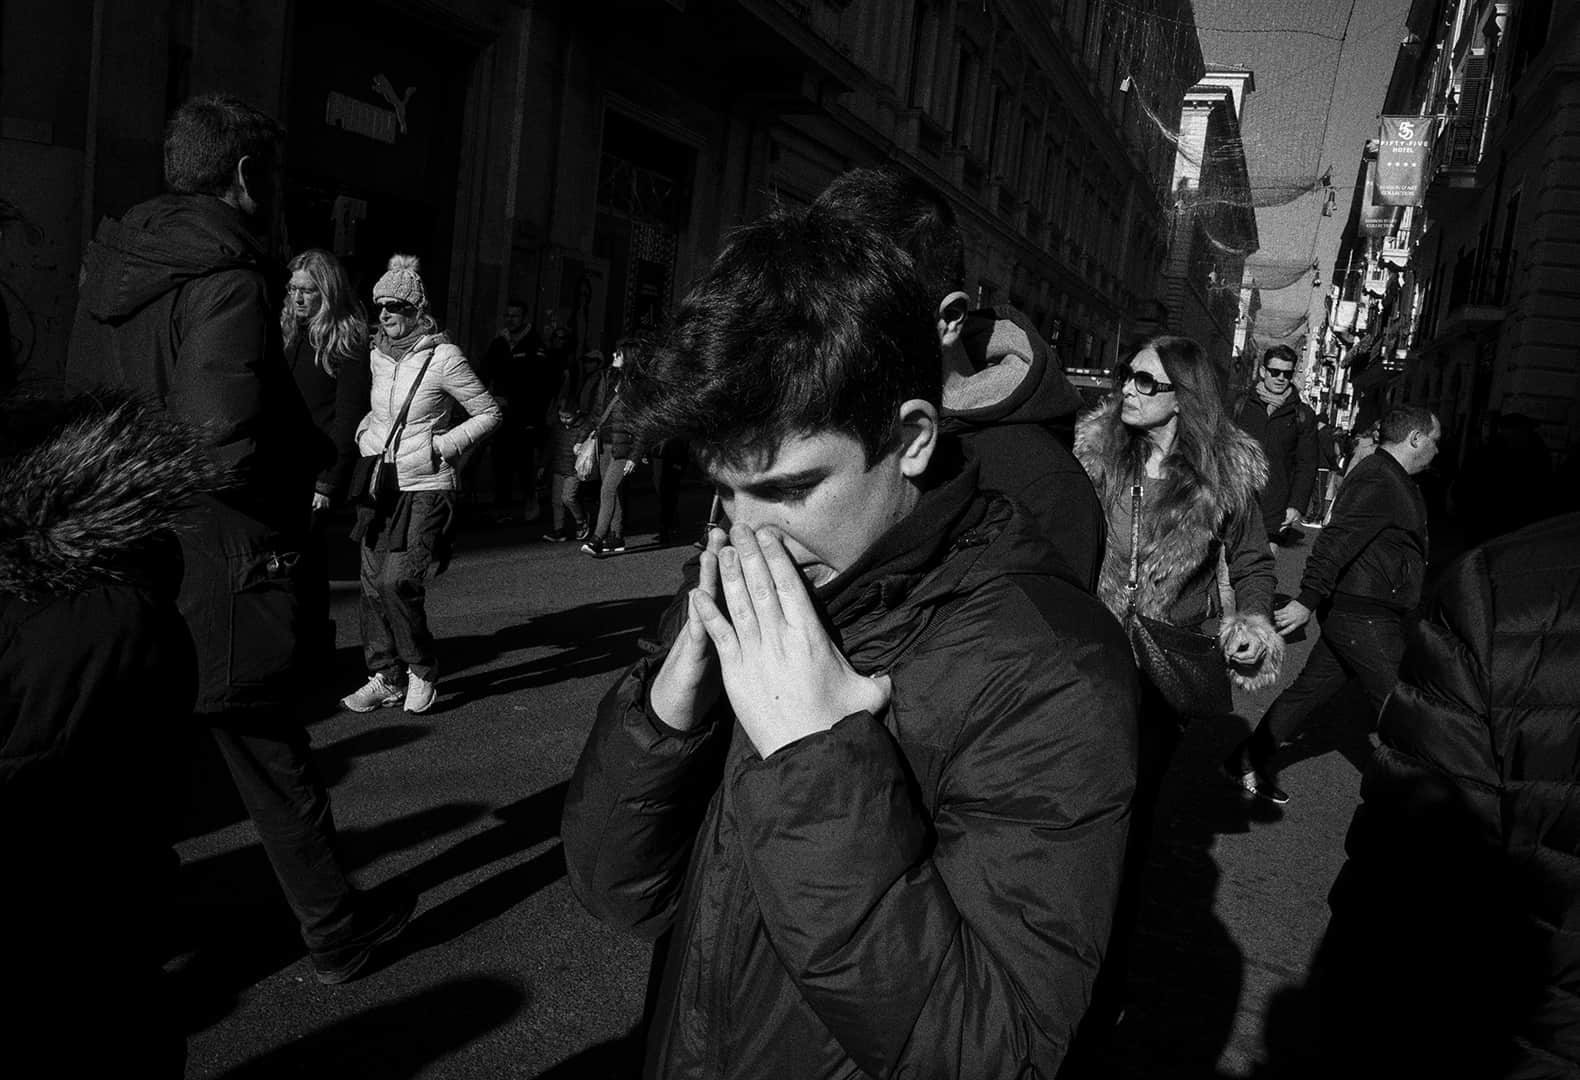 street photography people